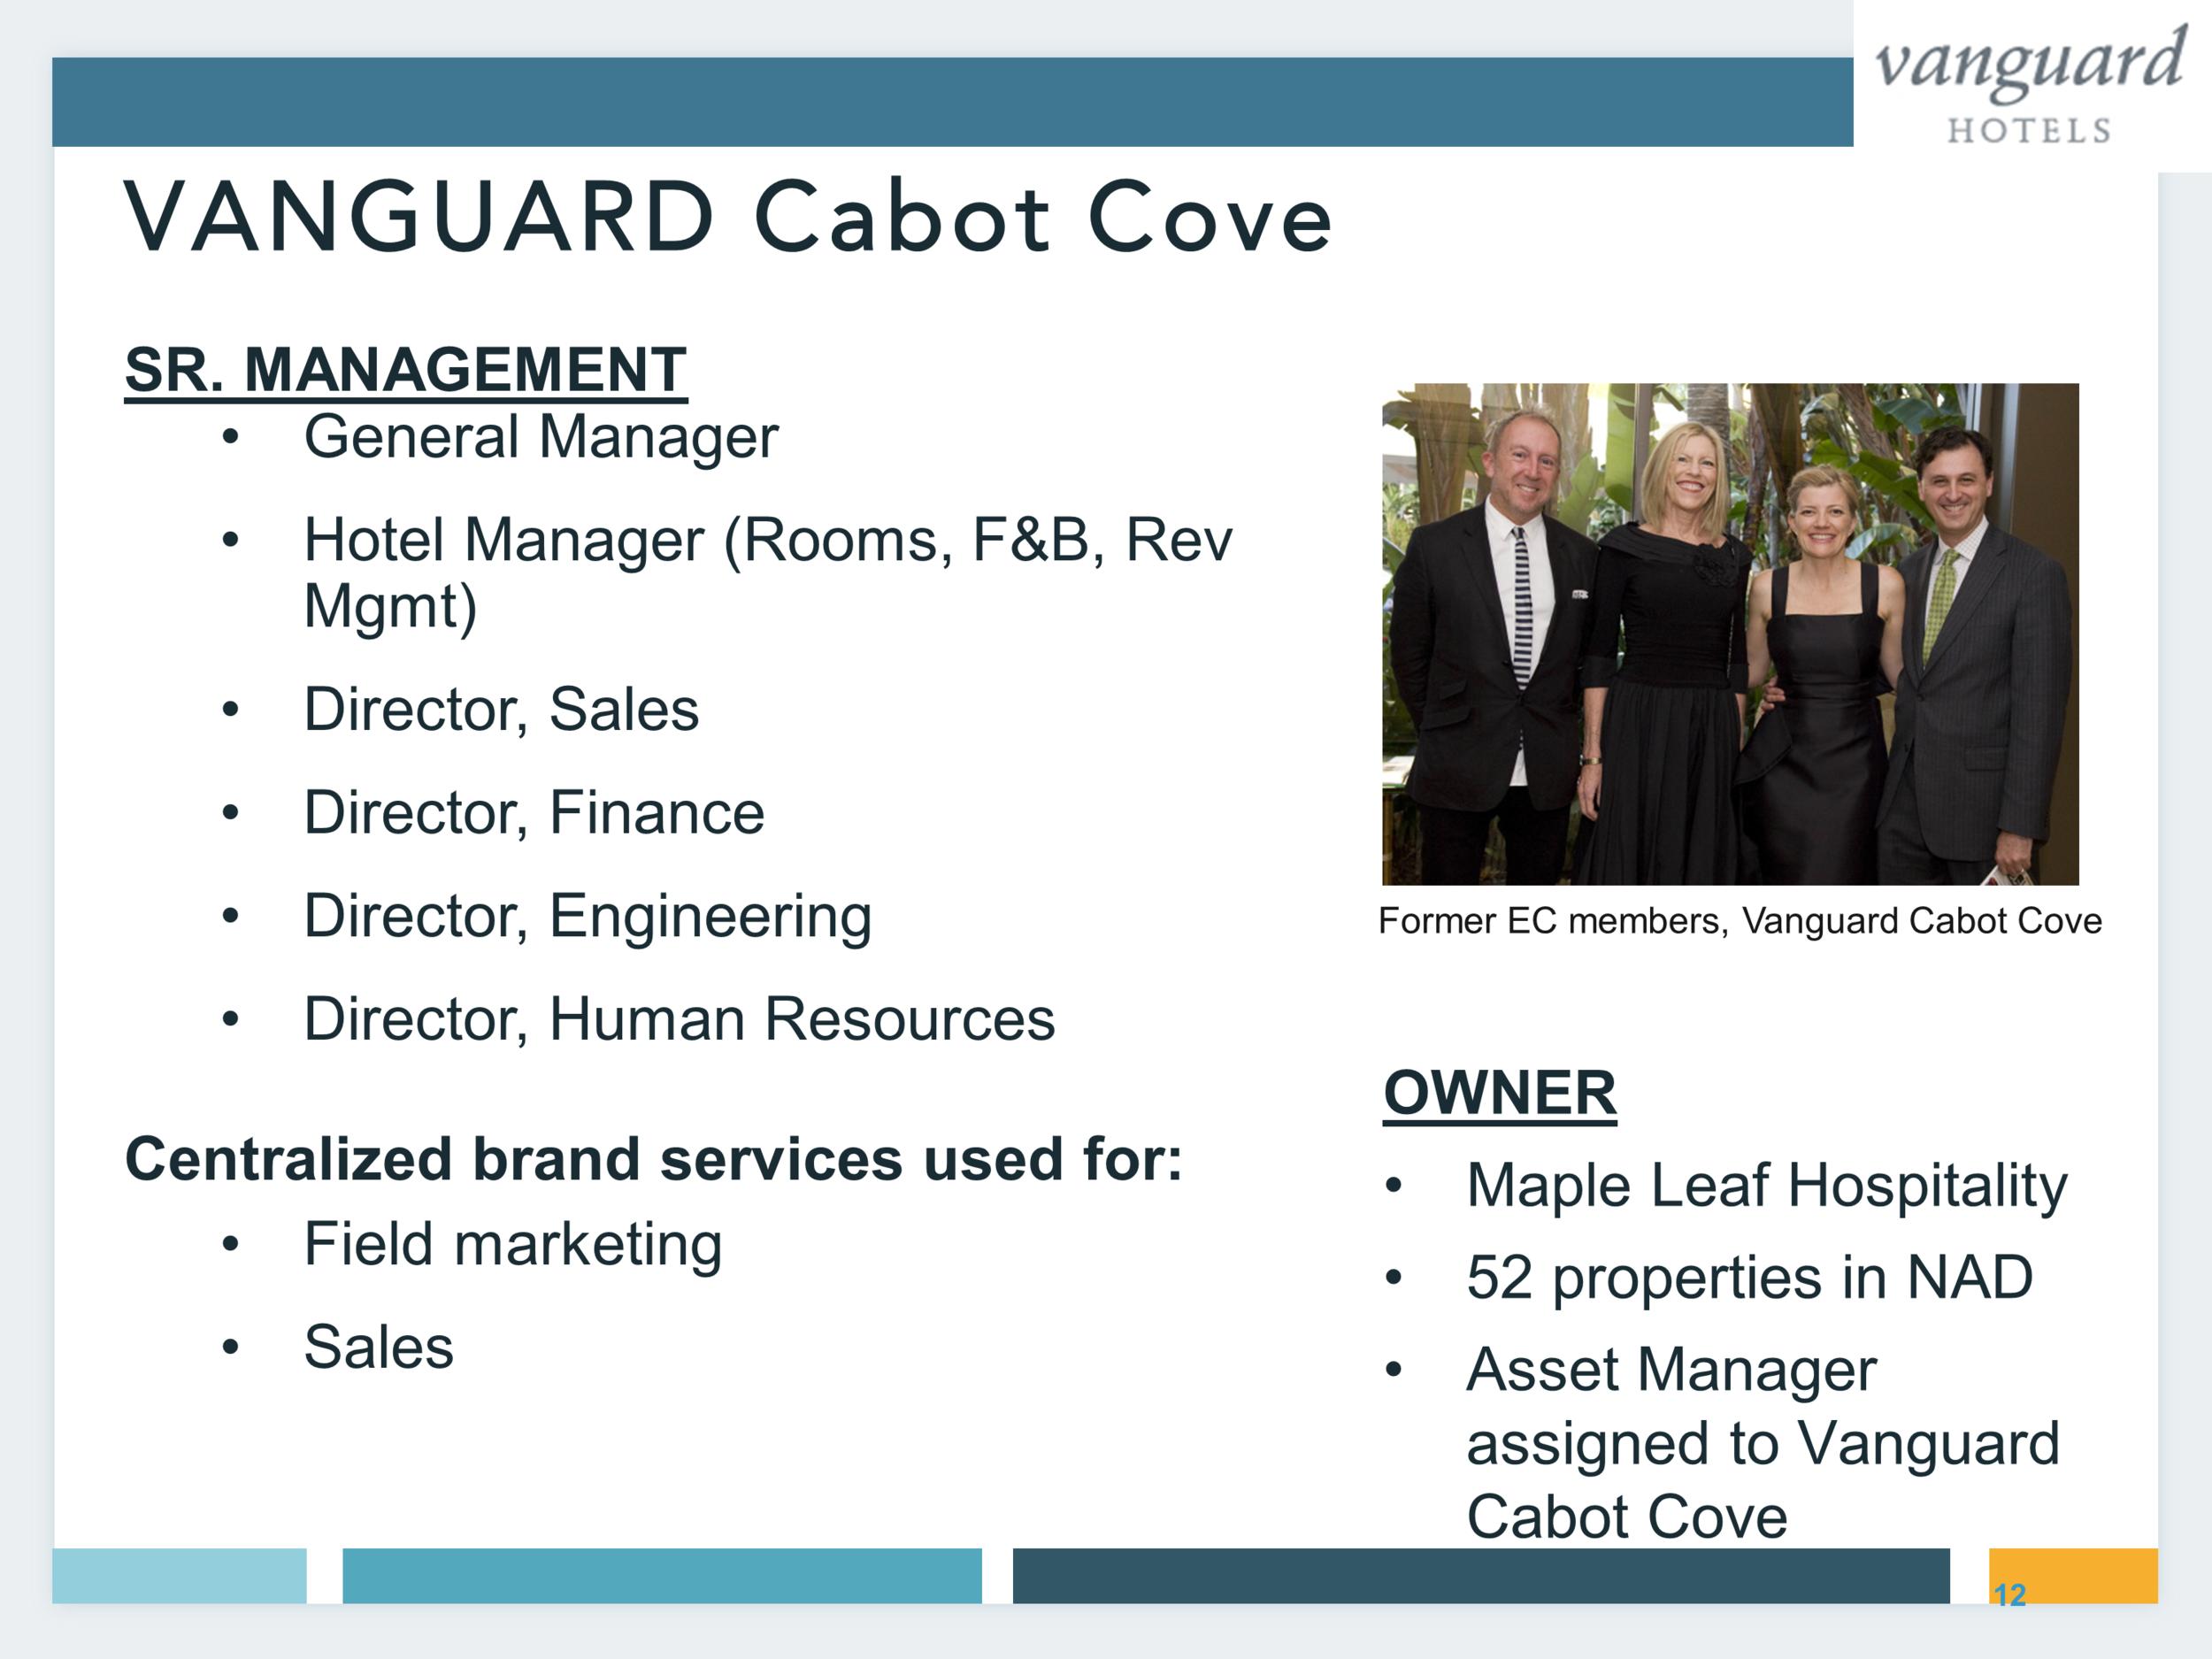 Vanguard Cabot Cove Management Roles